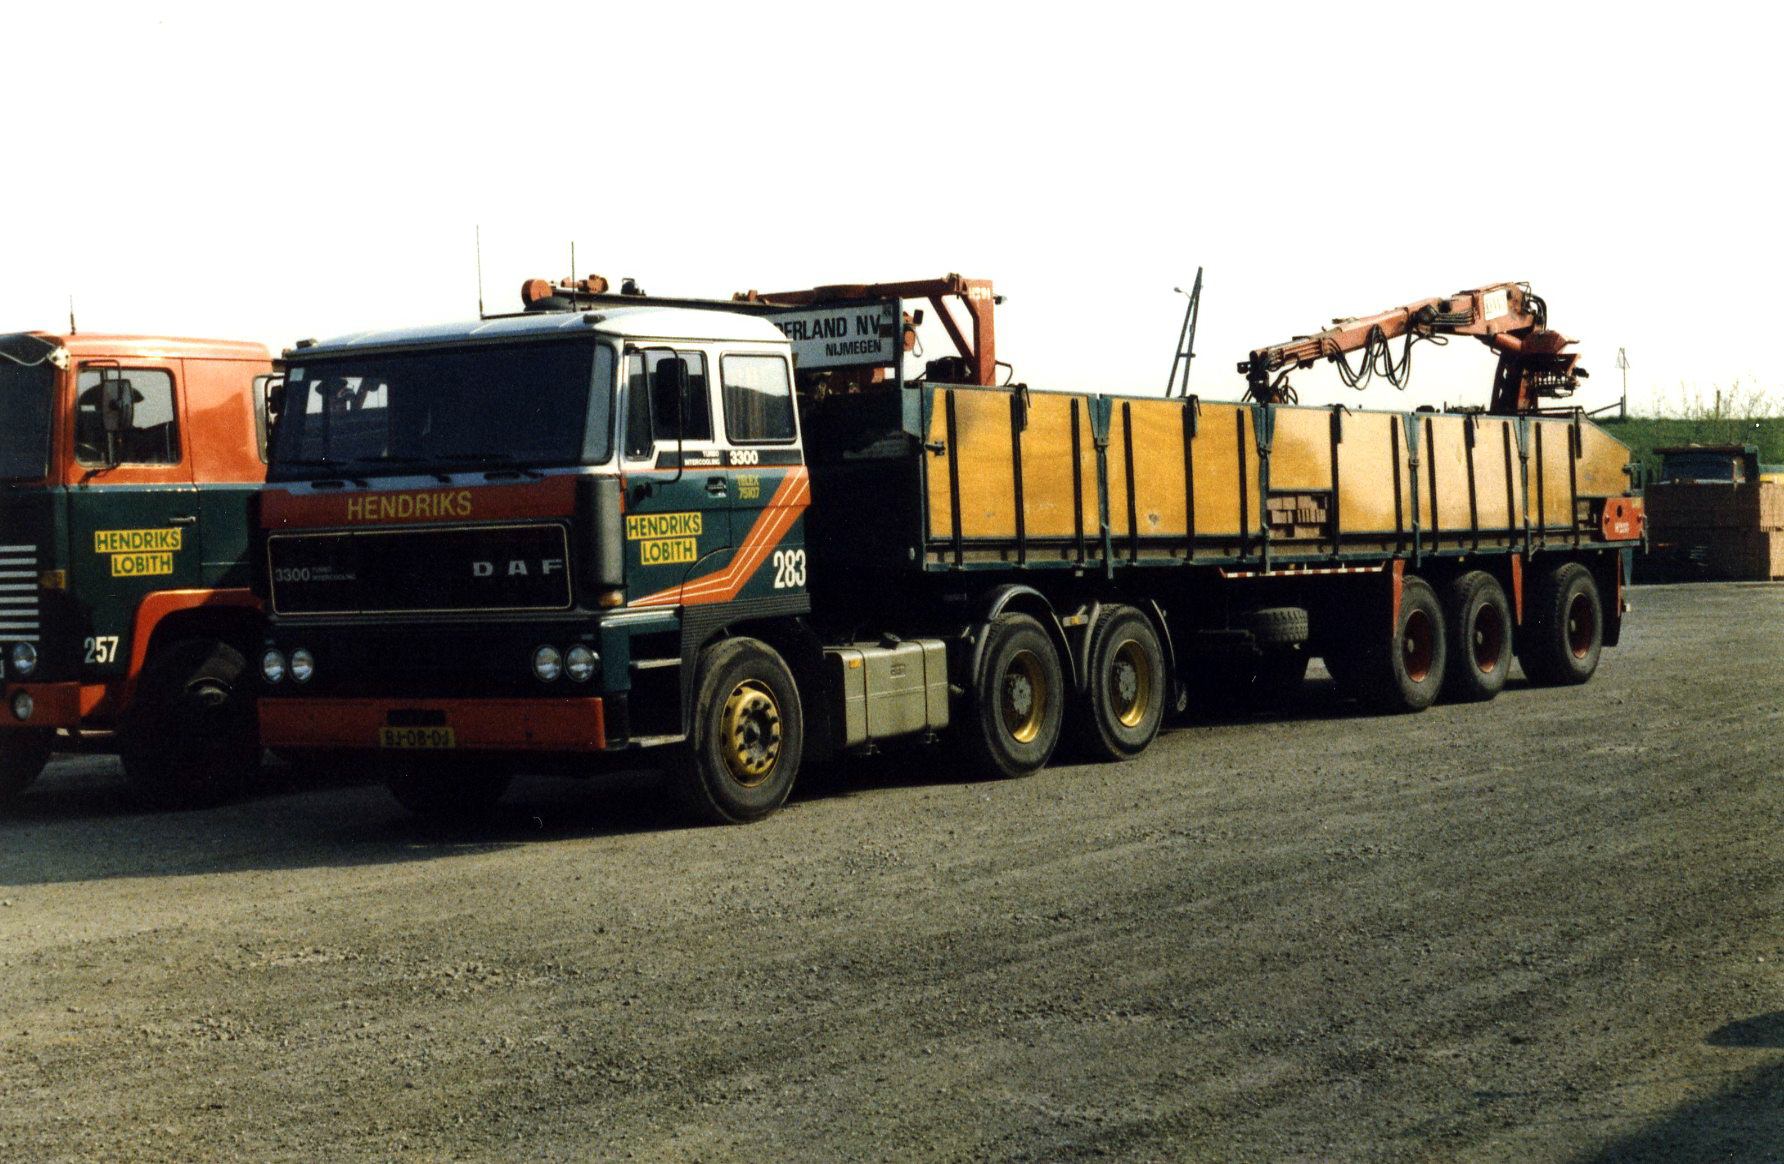 Hendriks-Lobith-DAF-FTT3300-BJ08DJ